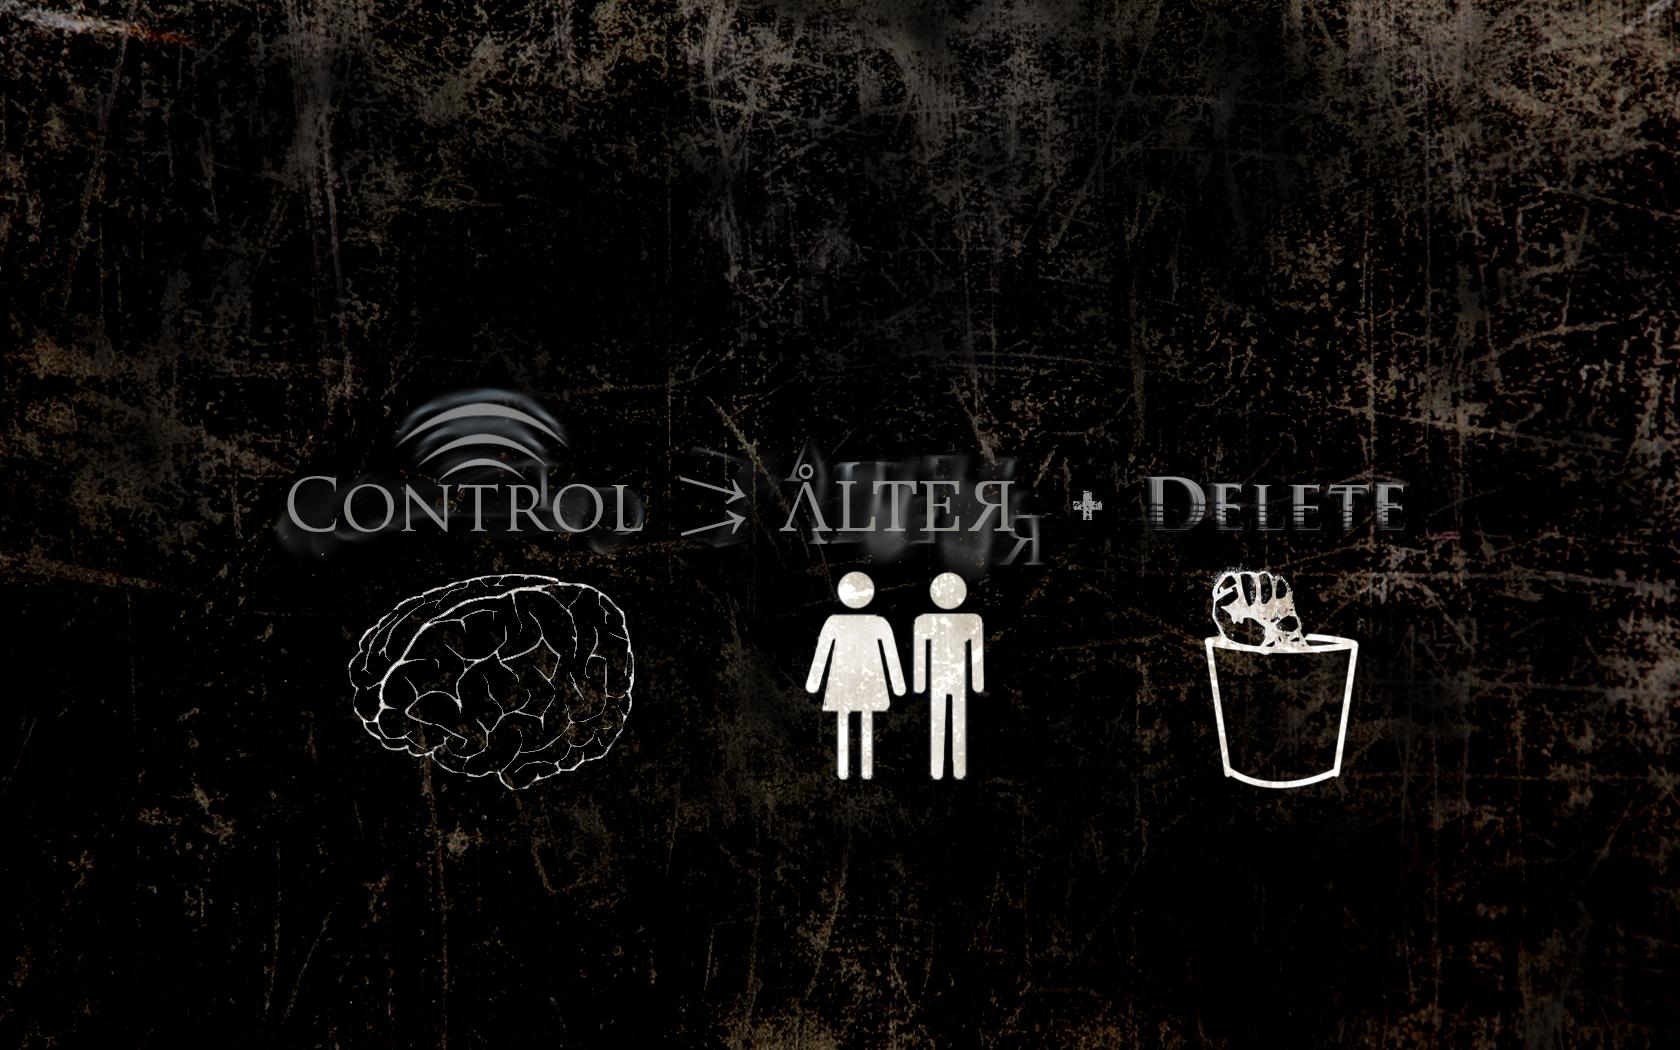 Snap Control Alt Delete Wallpaper Photos On Pinterest